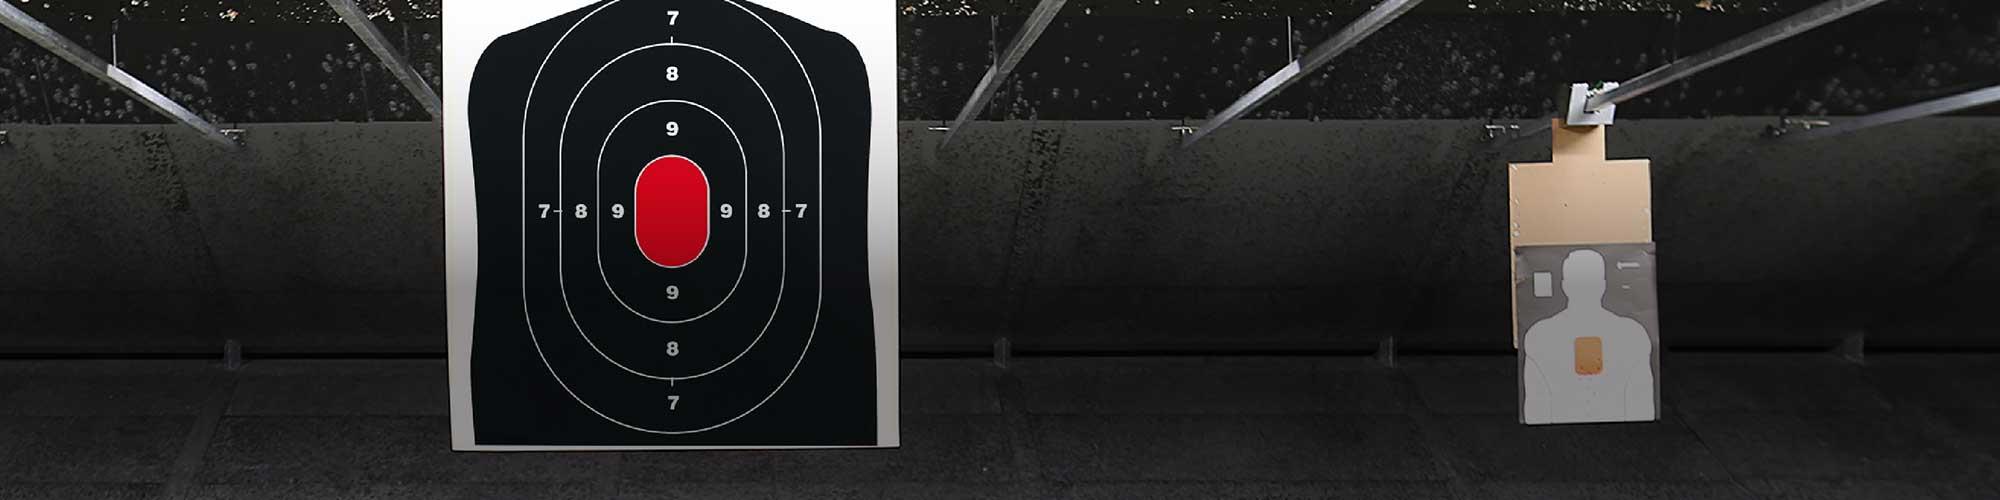 The best prices on handguns